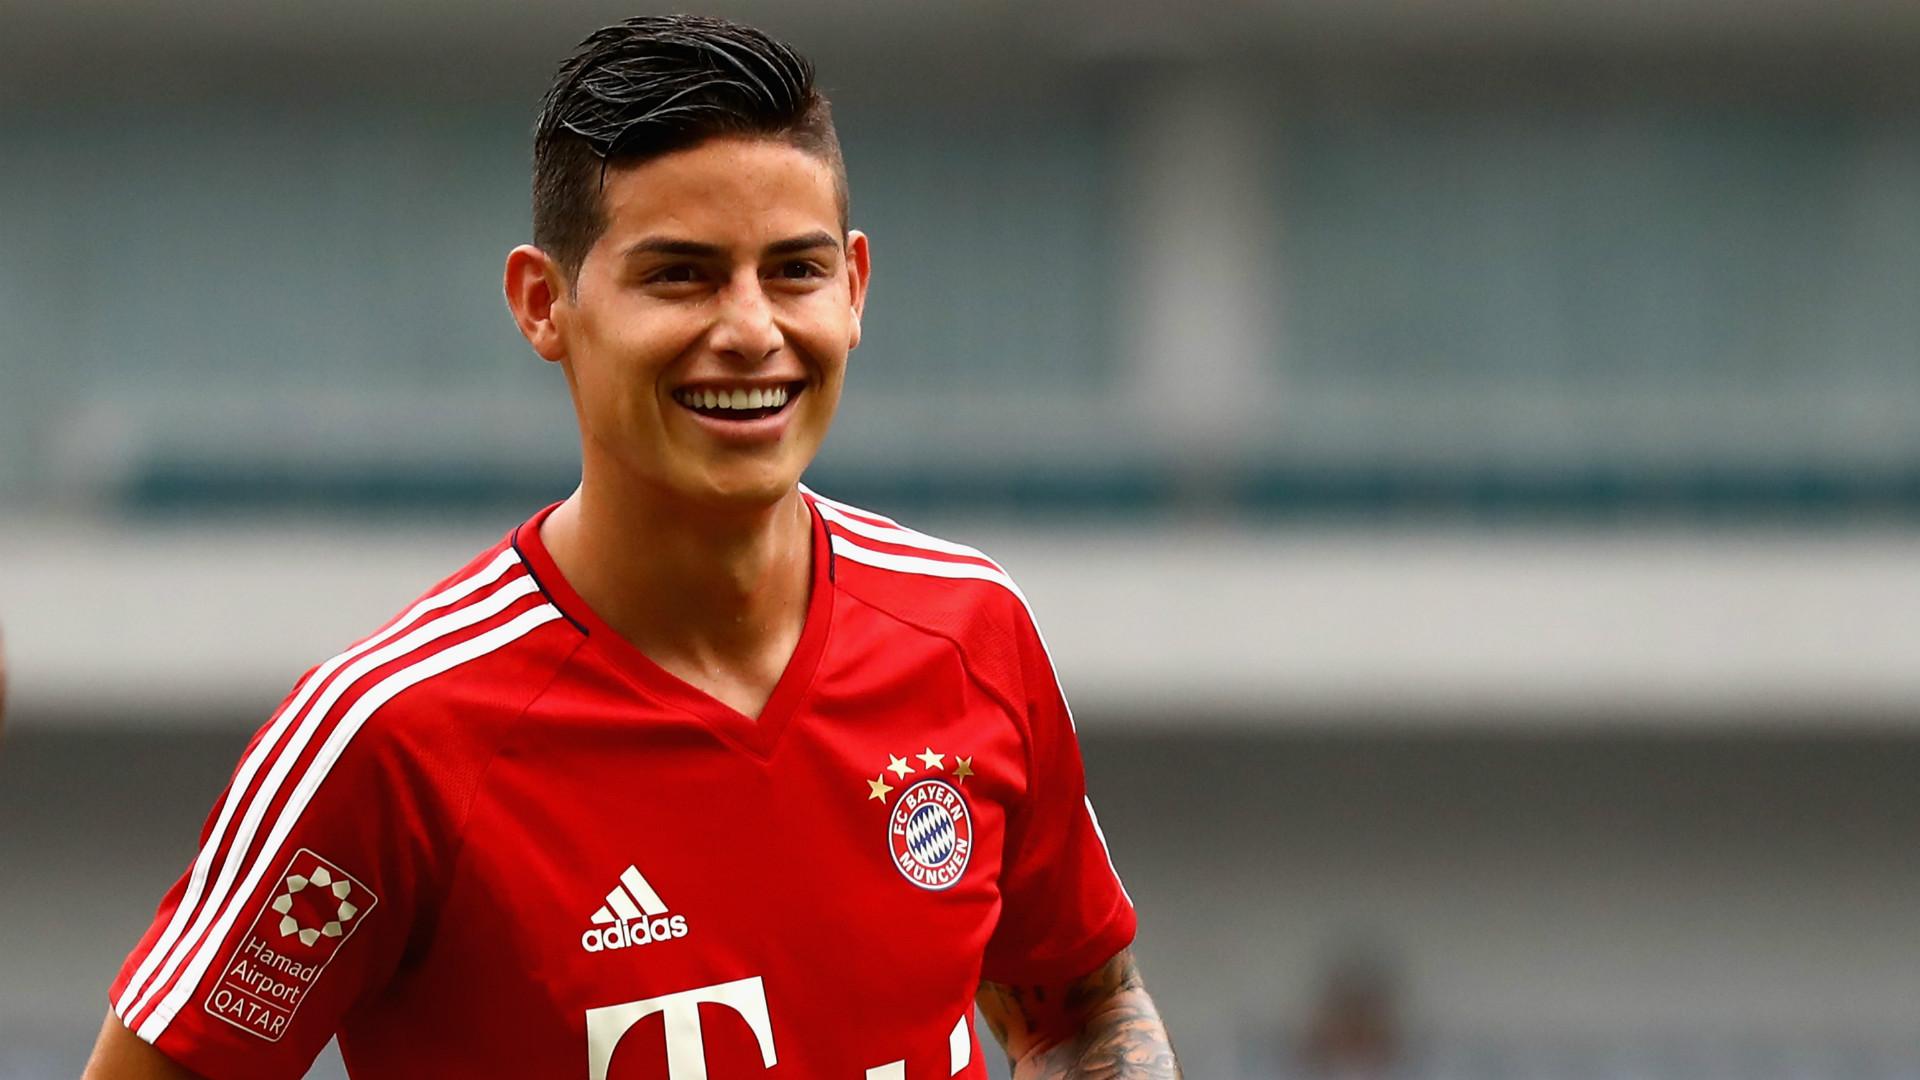 Bayern Munich vs Arsenal: TV channel, stream, kick-off